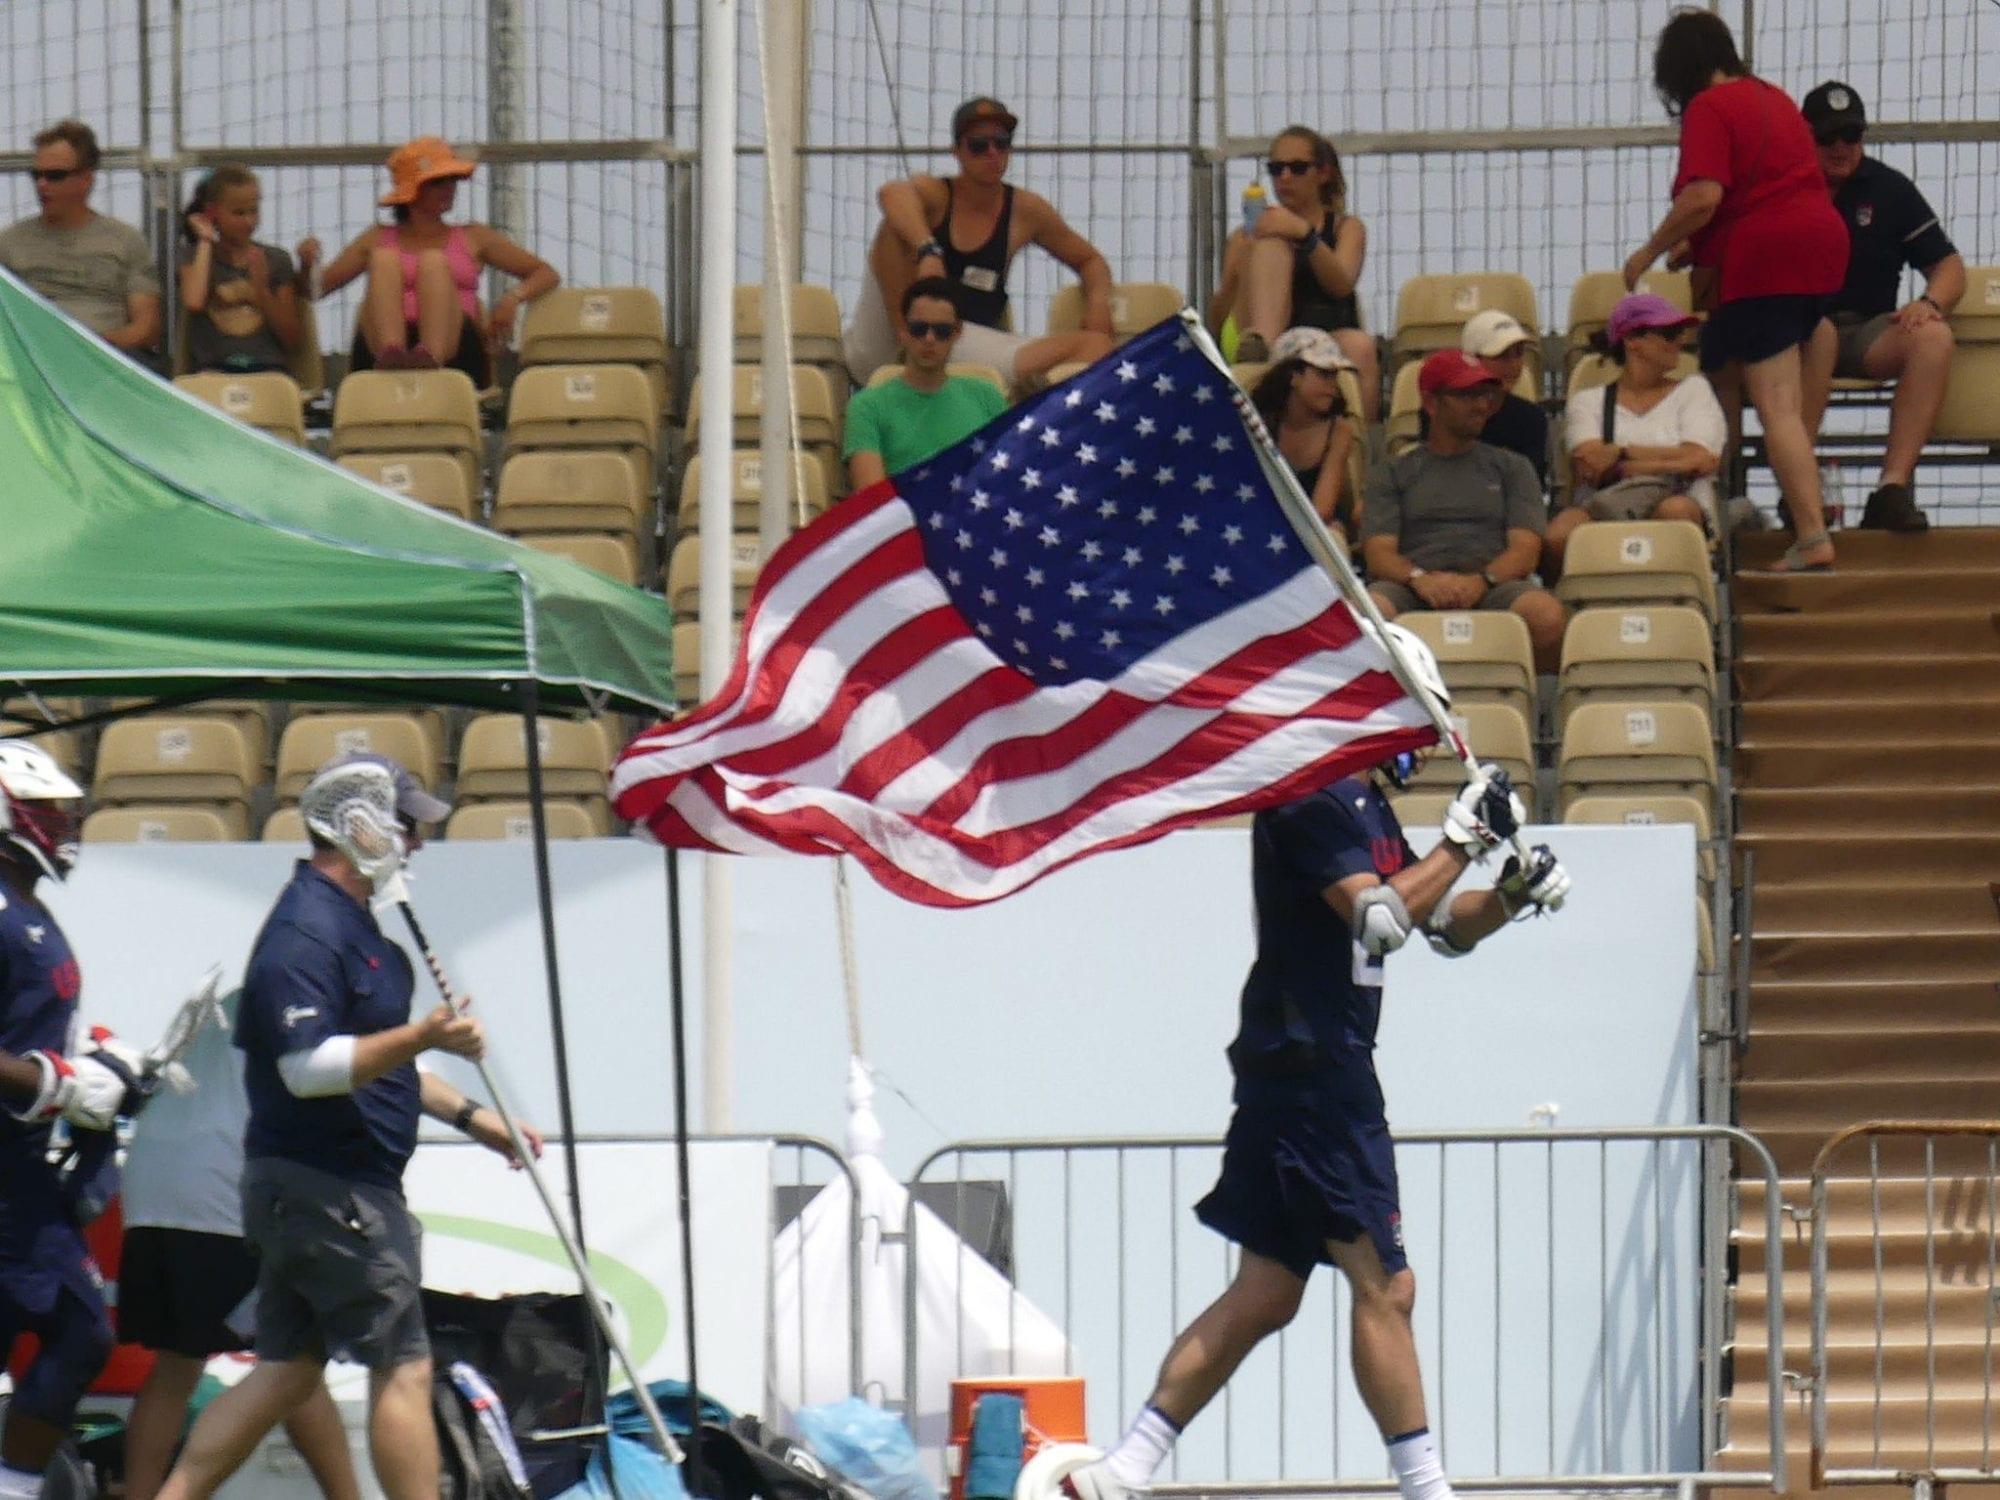 Photo: USA Australia 2018 World Lacrosse Championships Roger DavisRoger Davis / World Lacrosse Championships